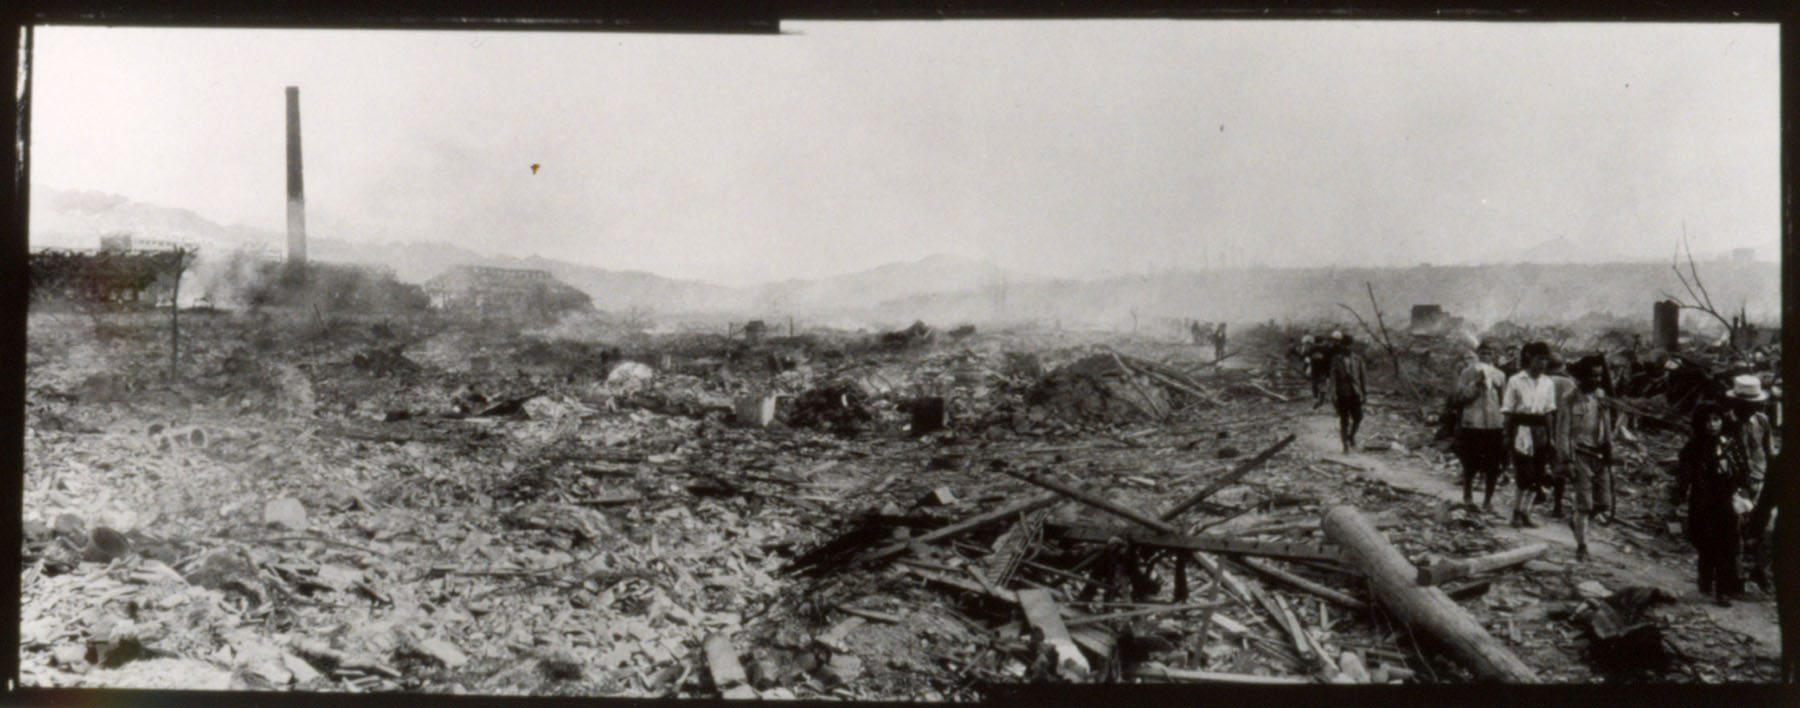 August 10, 1945. Nagasaki Panorama